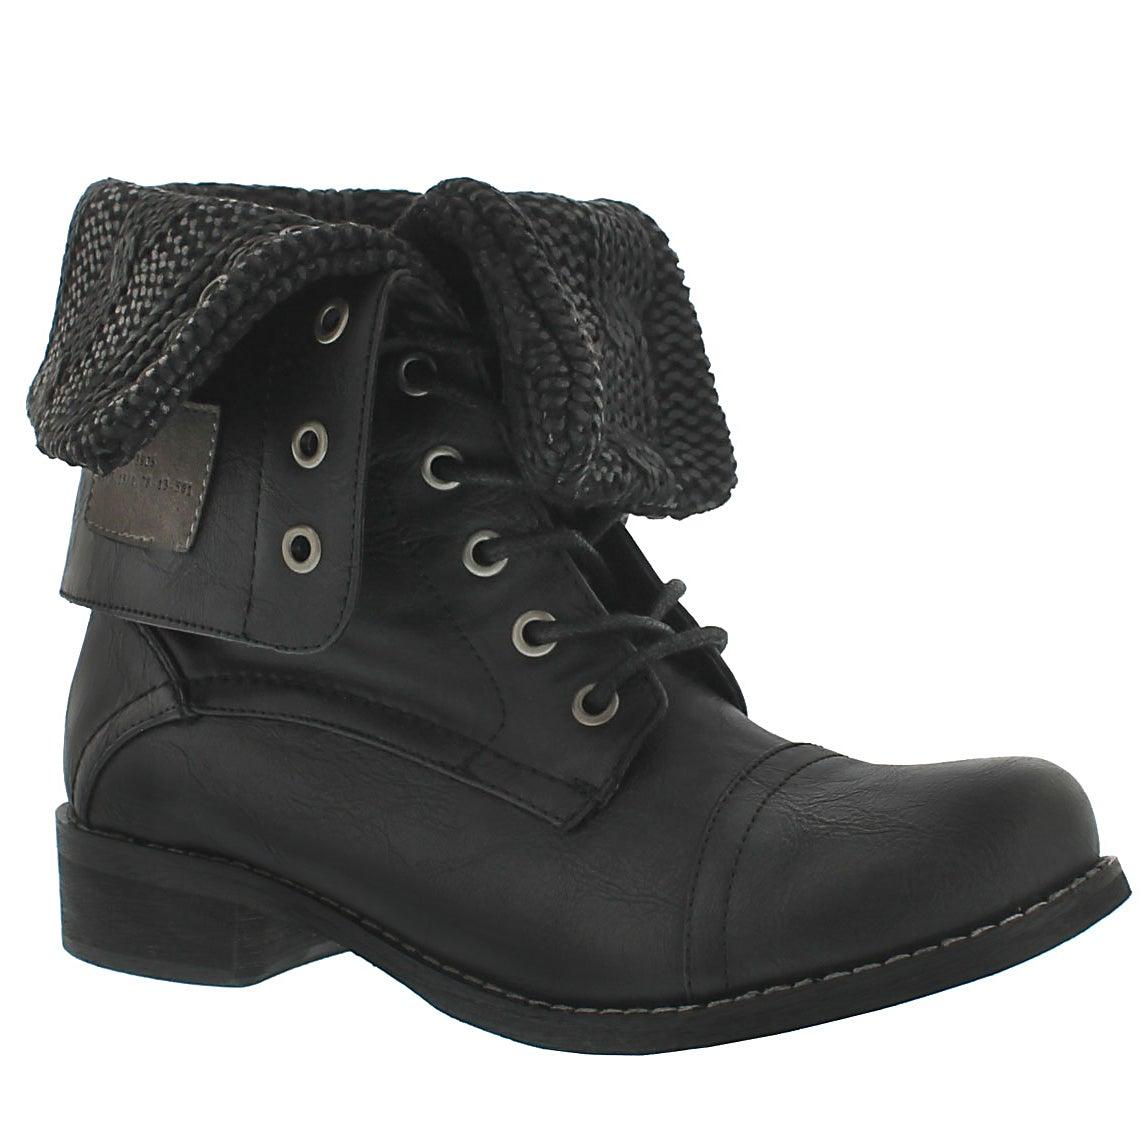 Women's BEV black lace up fold down combat boots